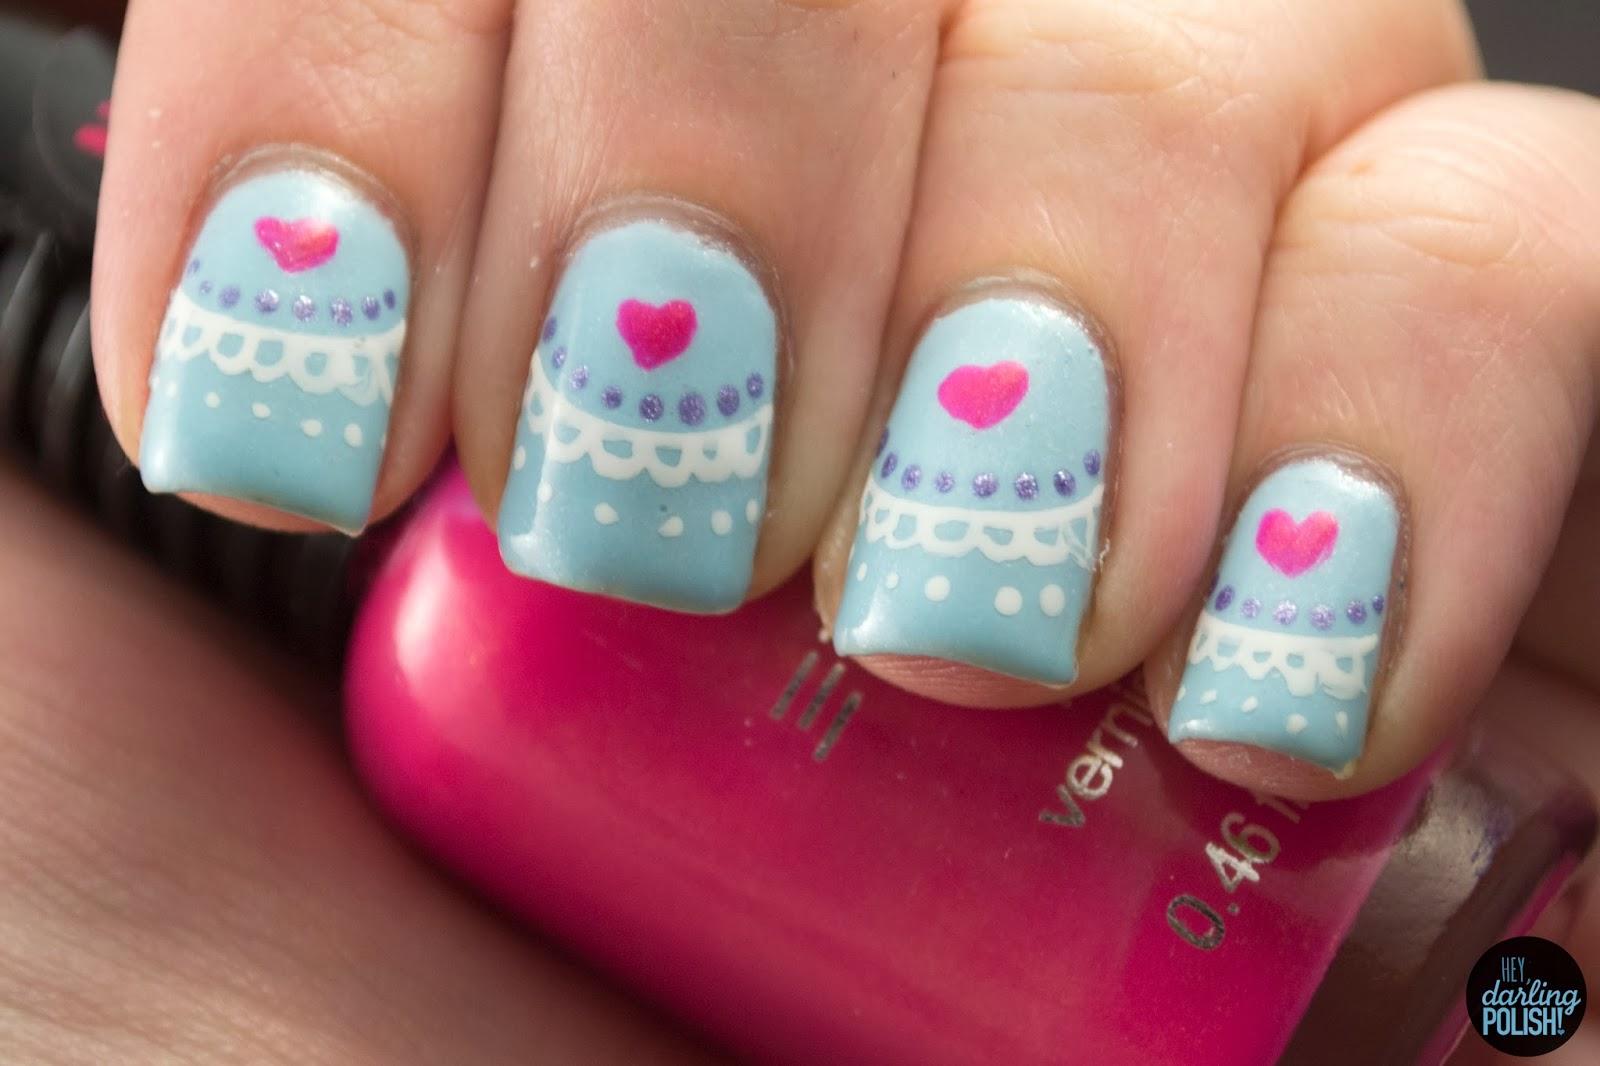 nails, nail art, nail polish, polish, valentines, golden oldie thursdays, hearts, blue, hey darling polish